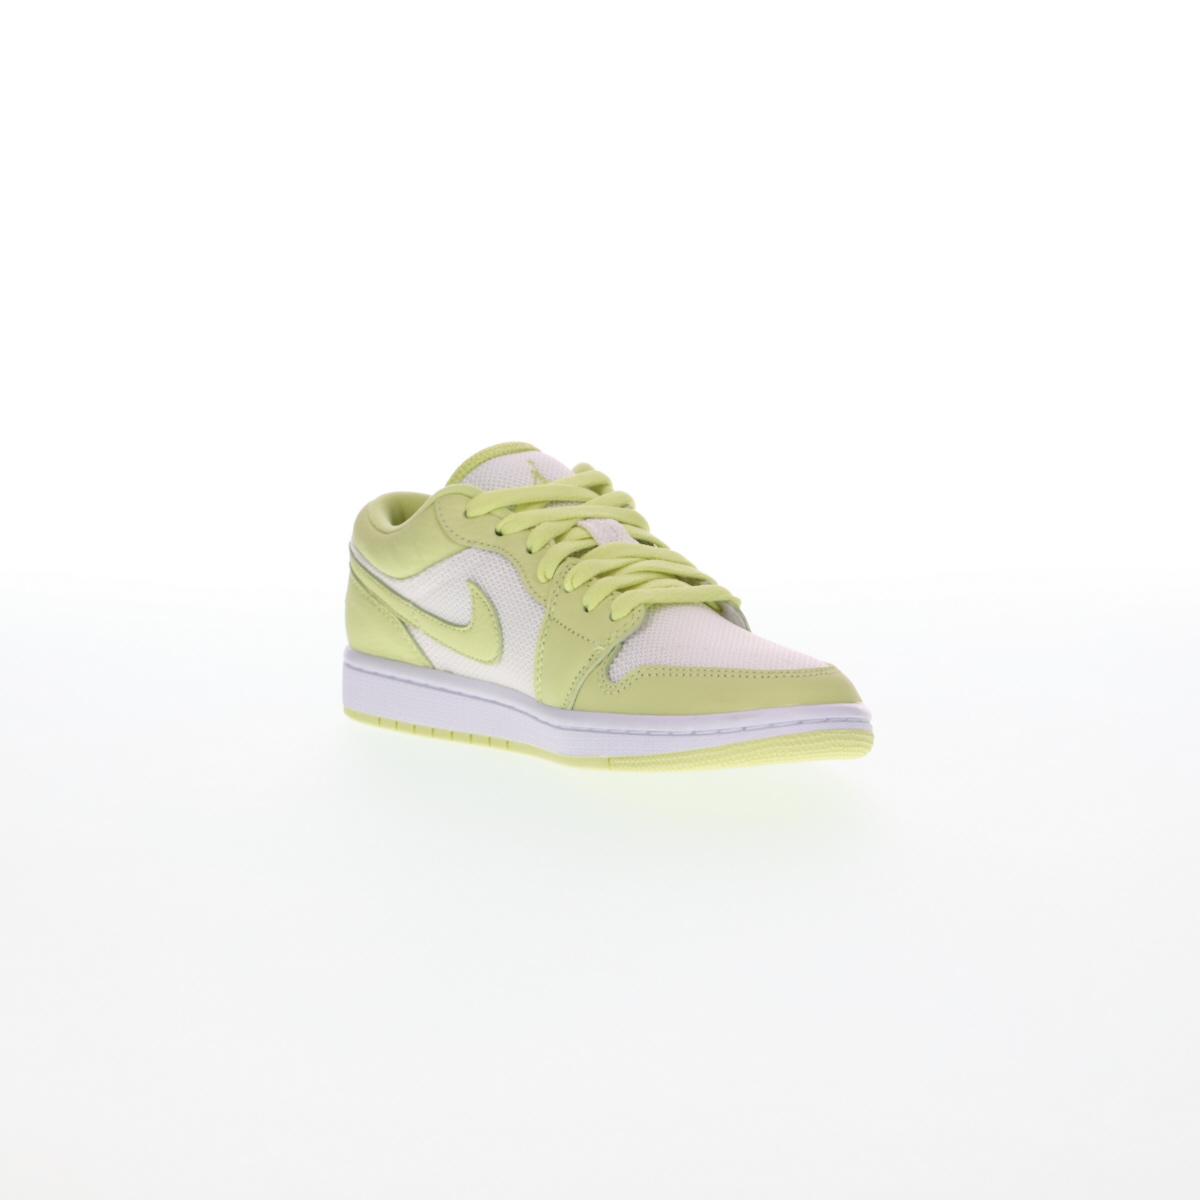 nike women's air presto running sneakers